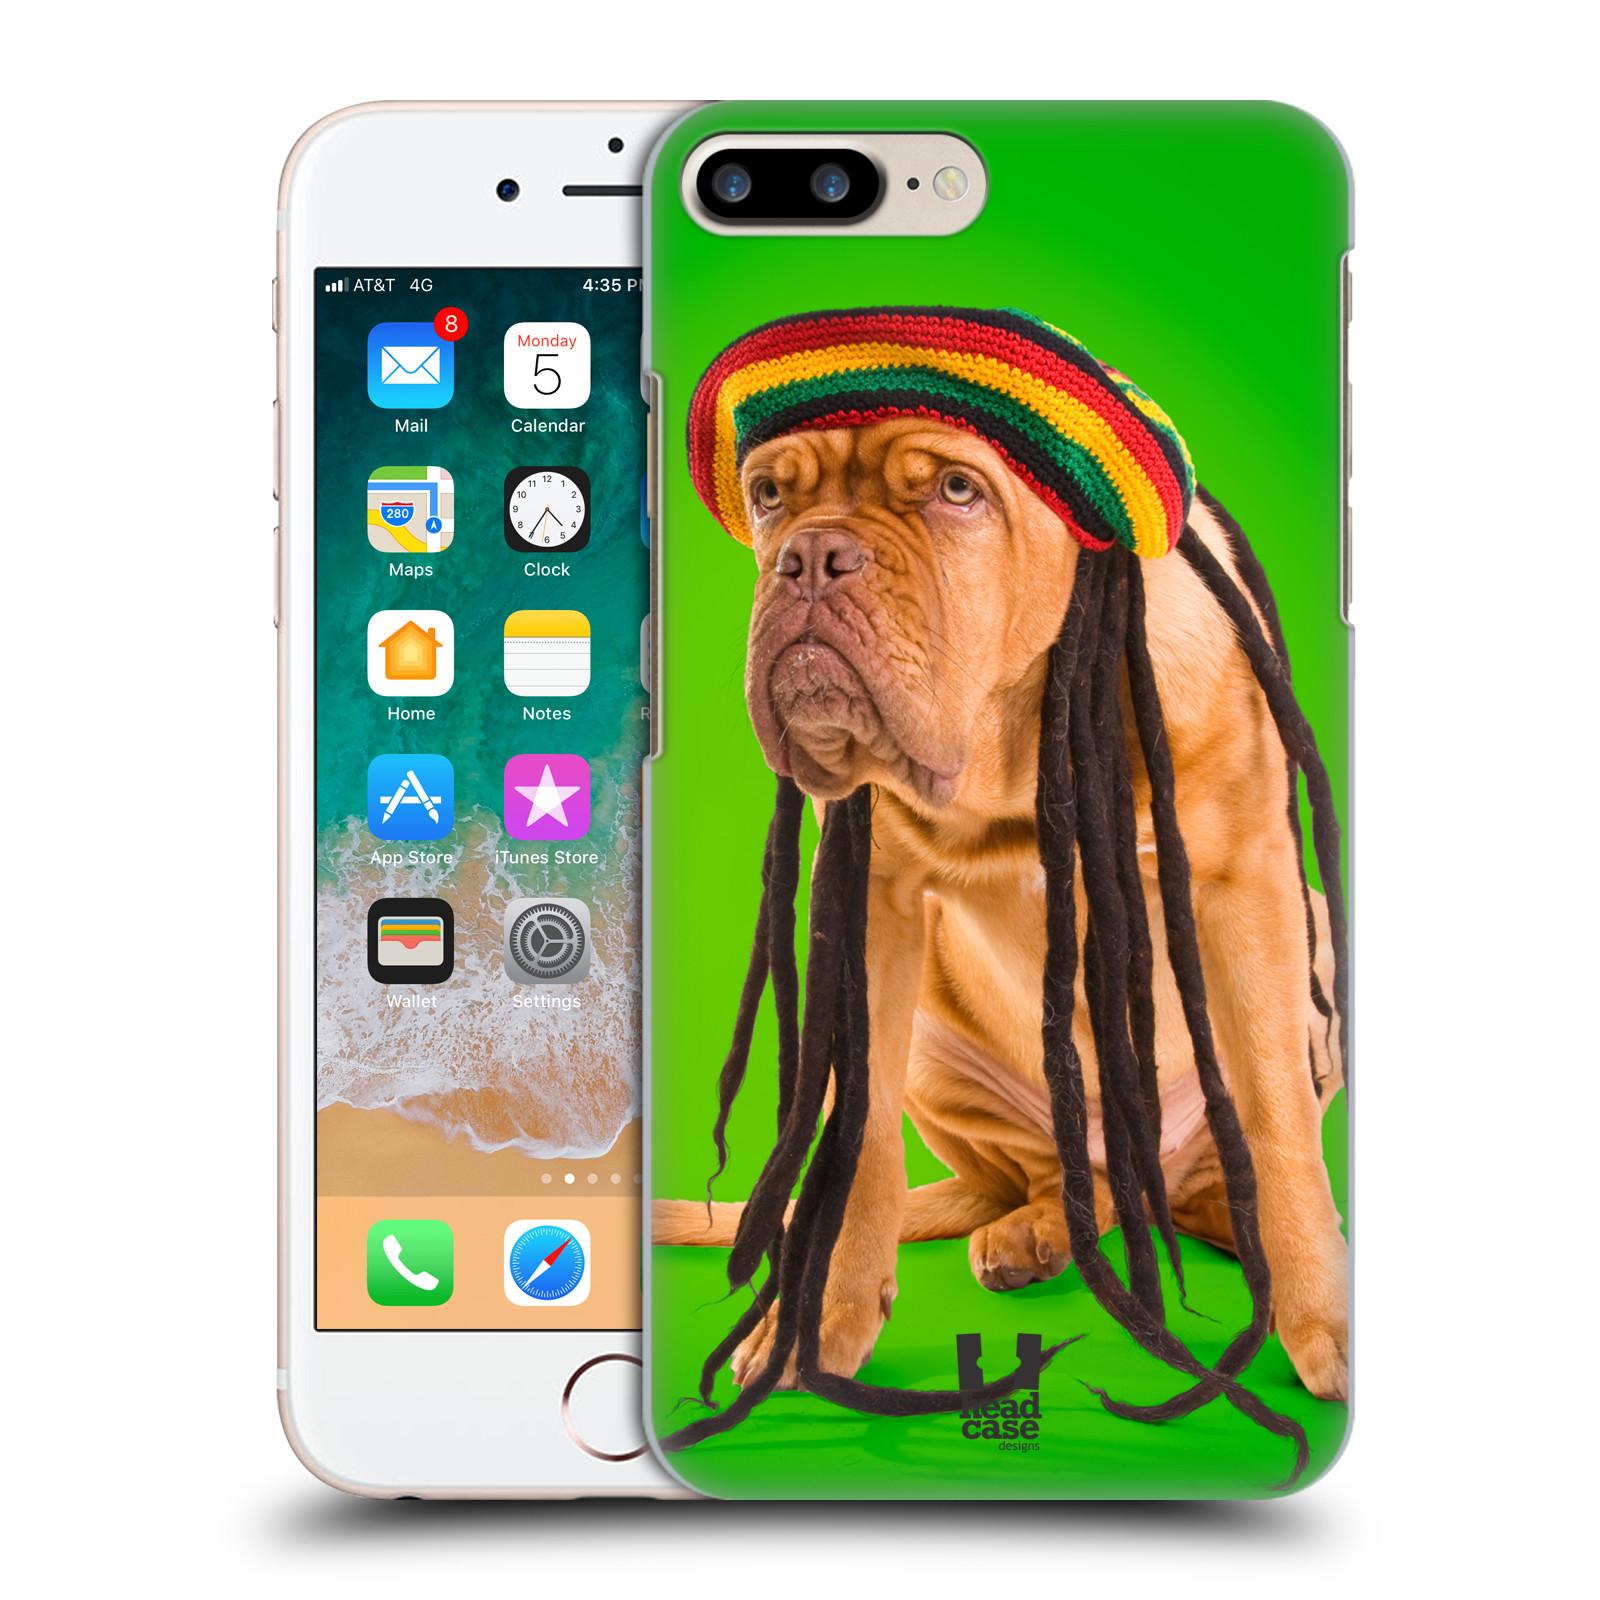 HEAD CASE plastový obal na mobil Apple Iphone 7 PLUS vzor Legrační zvířátka pejsek dredy Rastafarián